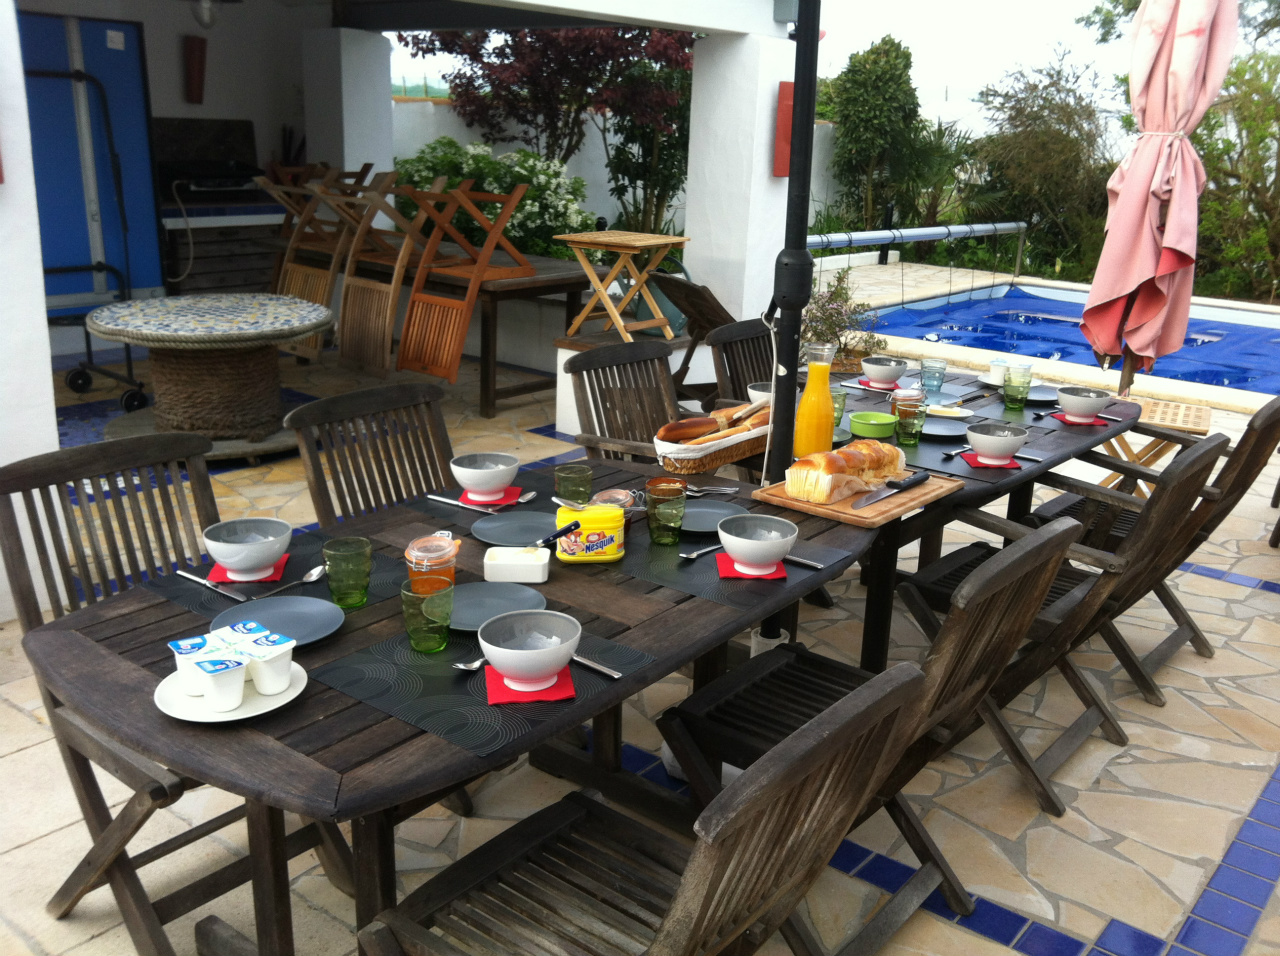 Petit-déjeuner en plein air